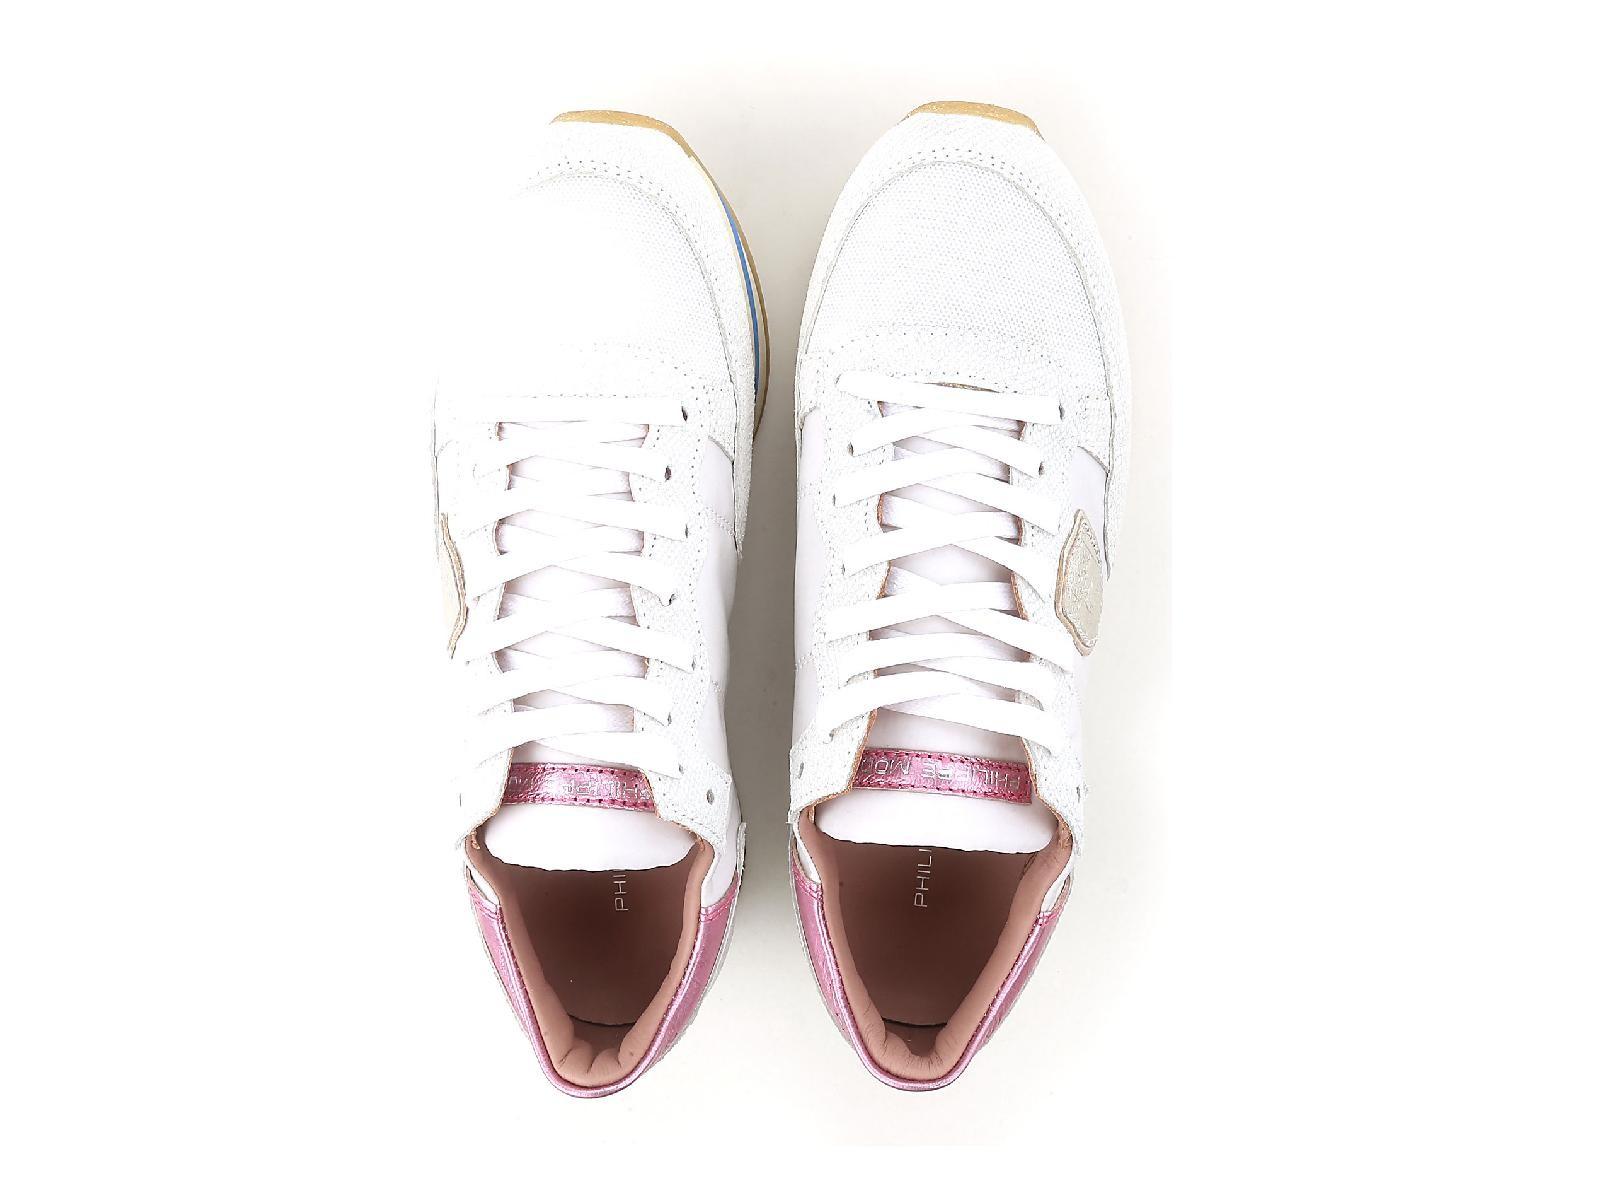 Philippe Model Donna Basse Lacci Scarpe Scarpe Scarpe Da Ginnastica Athletic scarpe in pelle bianca 4aabc7